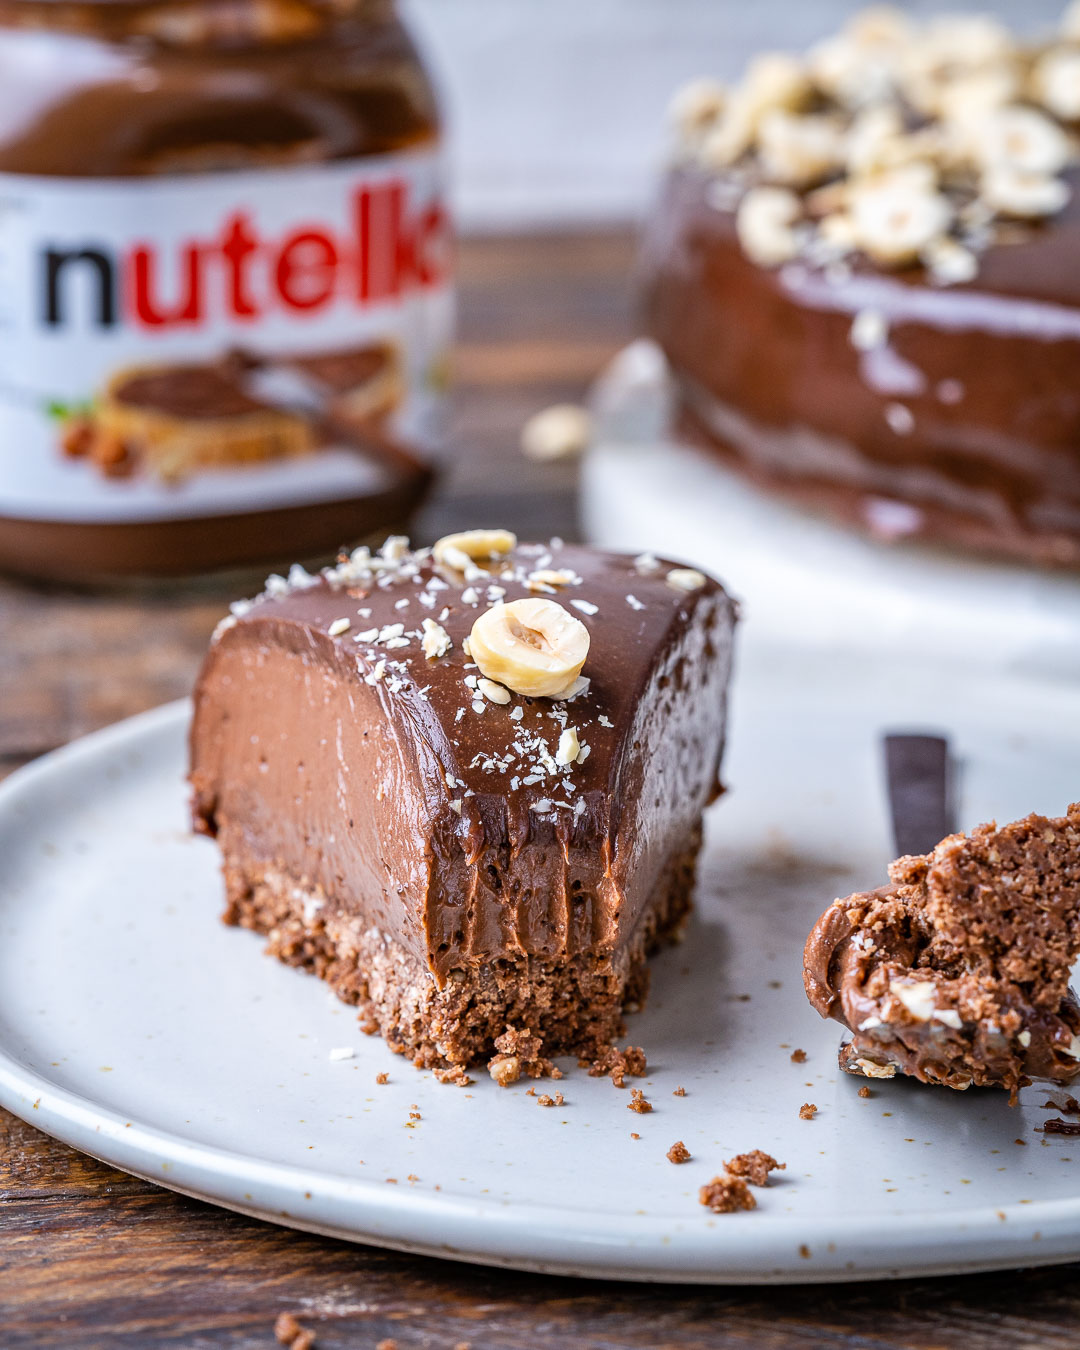 No Bake Nutella Cheesecake Recipe – Flourless Chocolate Cake Recipe - 1